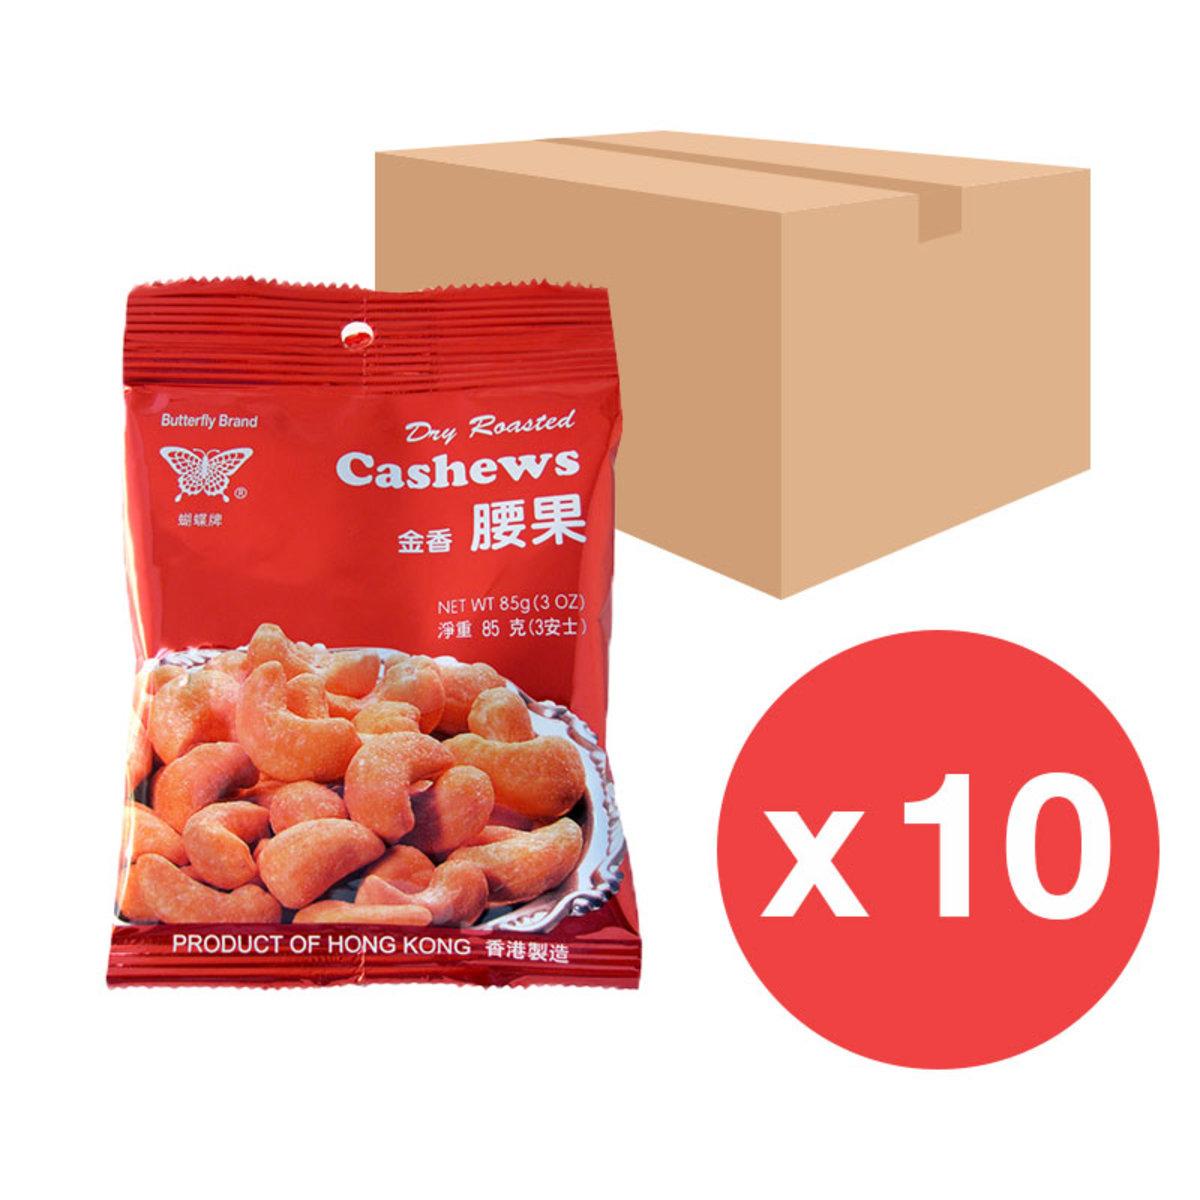 [Full case 10 bags] Dry Roasted Cashews